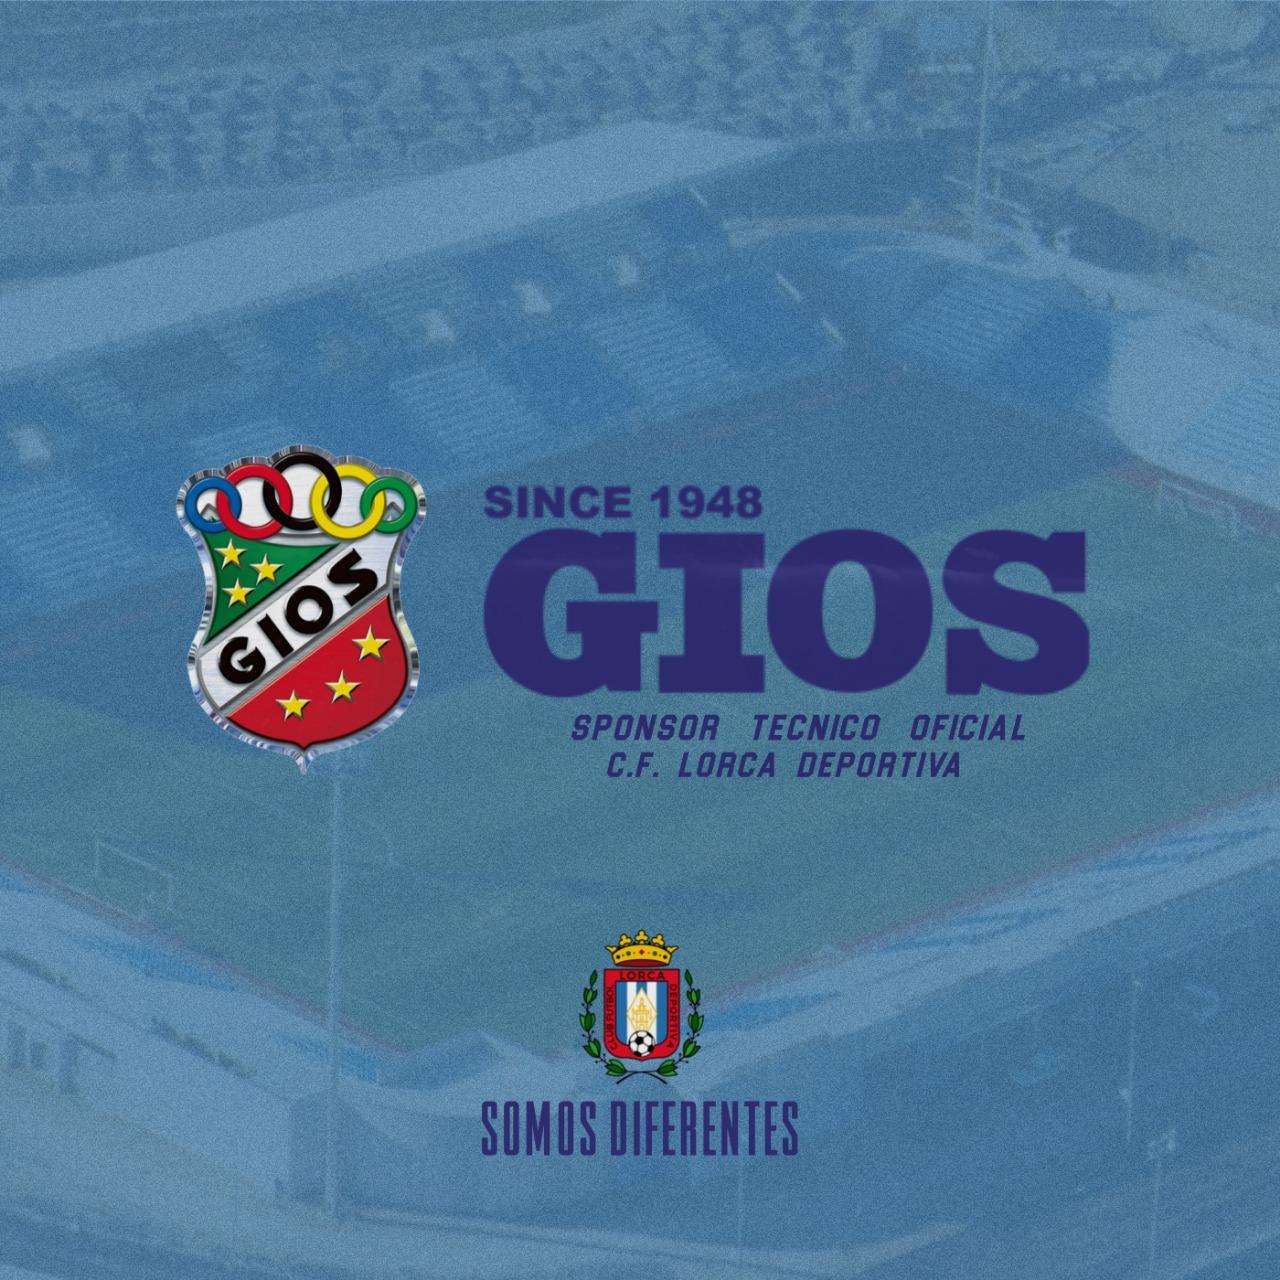 GIOS Teamwear, nuevo sponsor técnico oficial del club